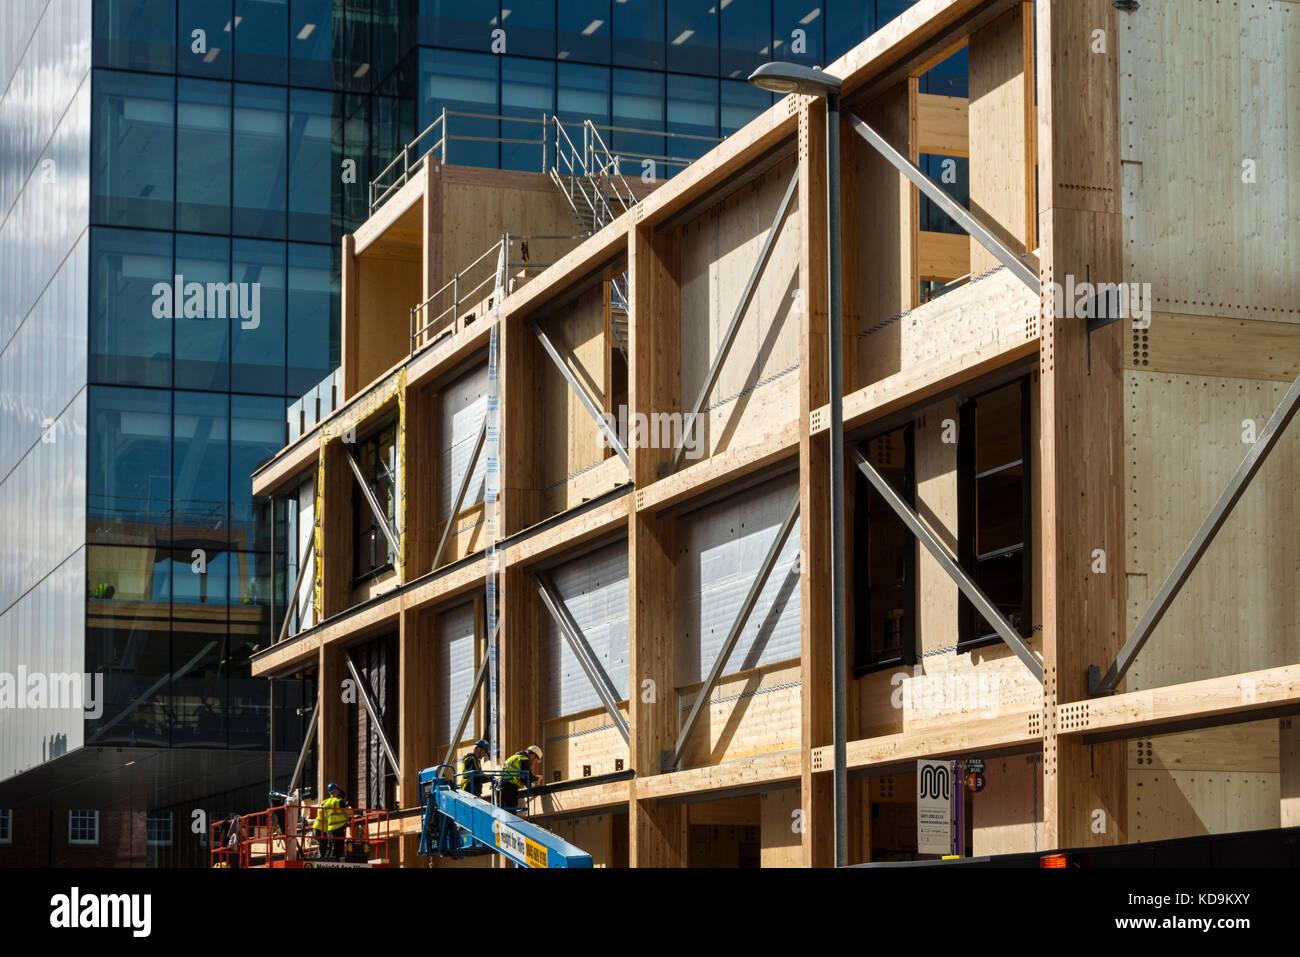 the-pavilion-a-timber-framed-building-un